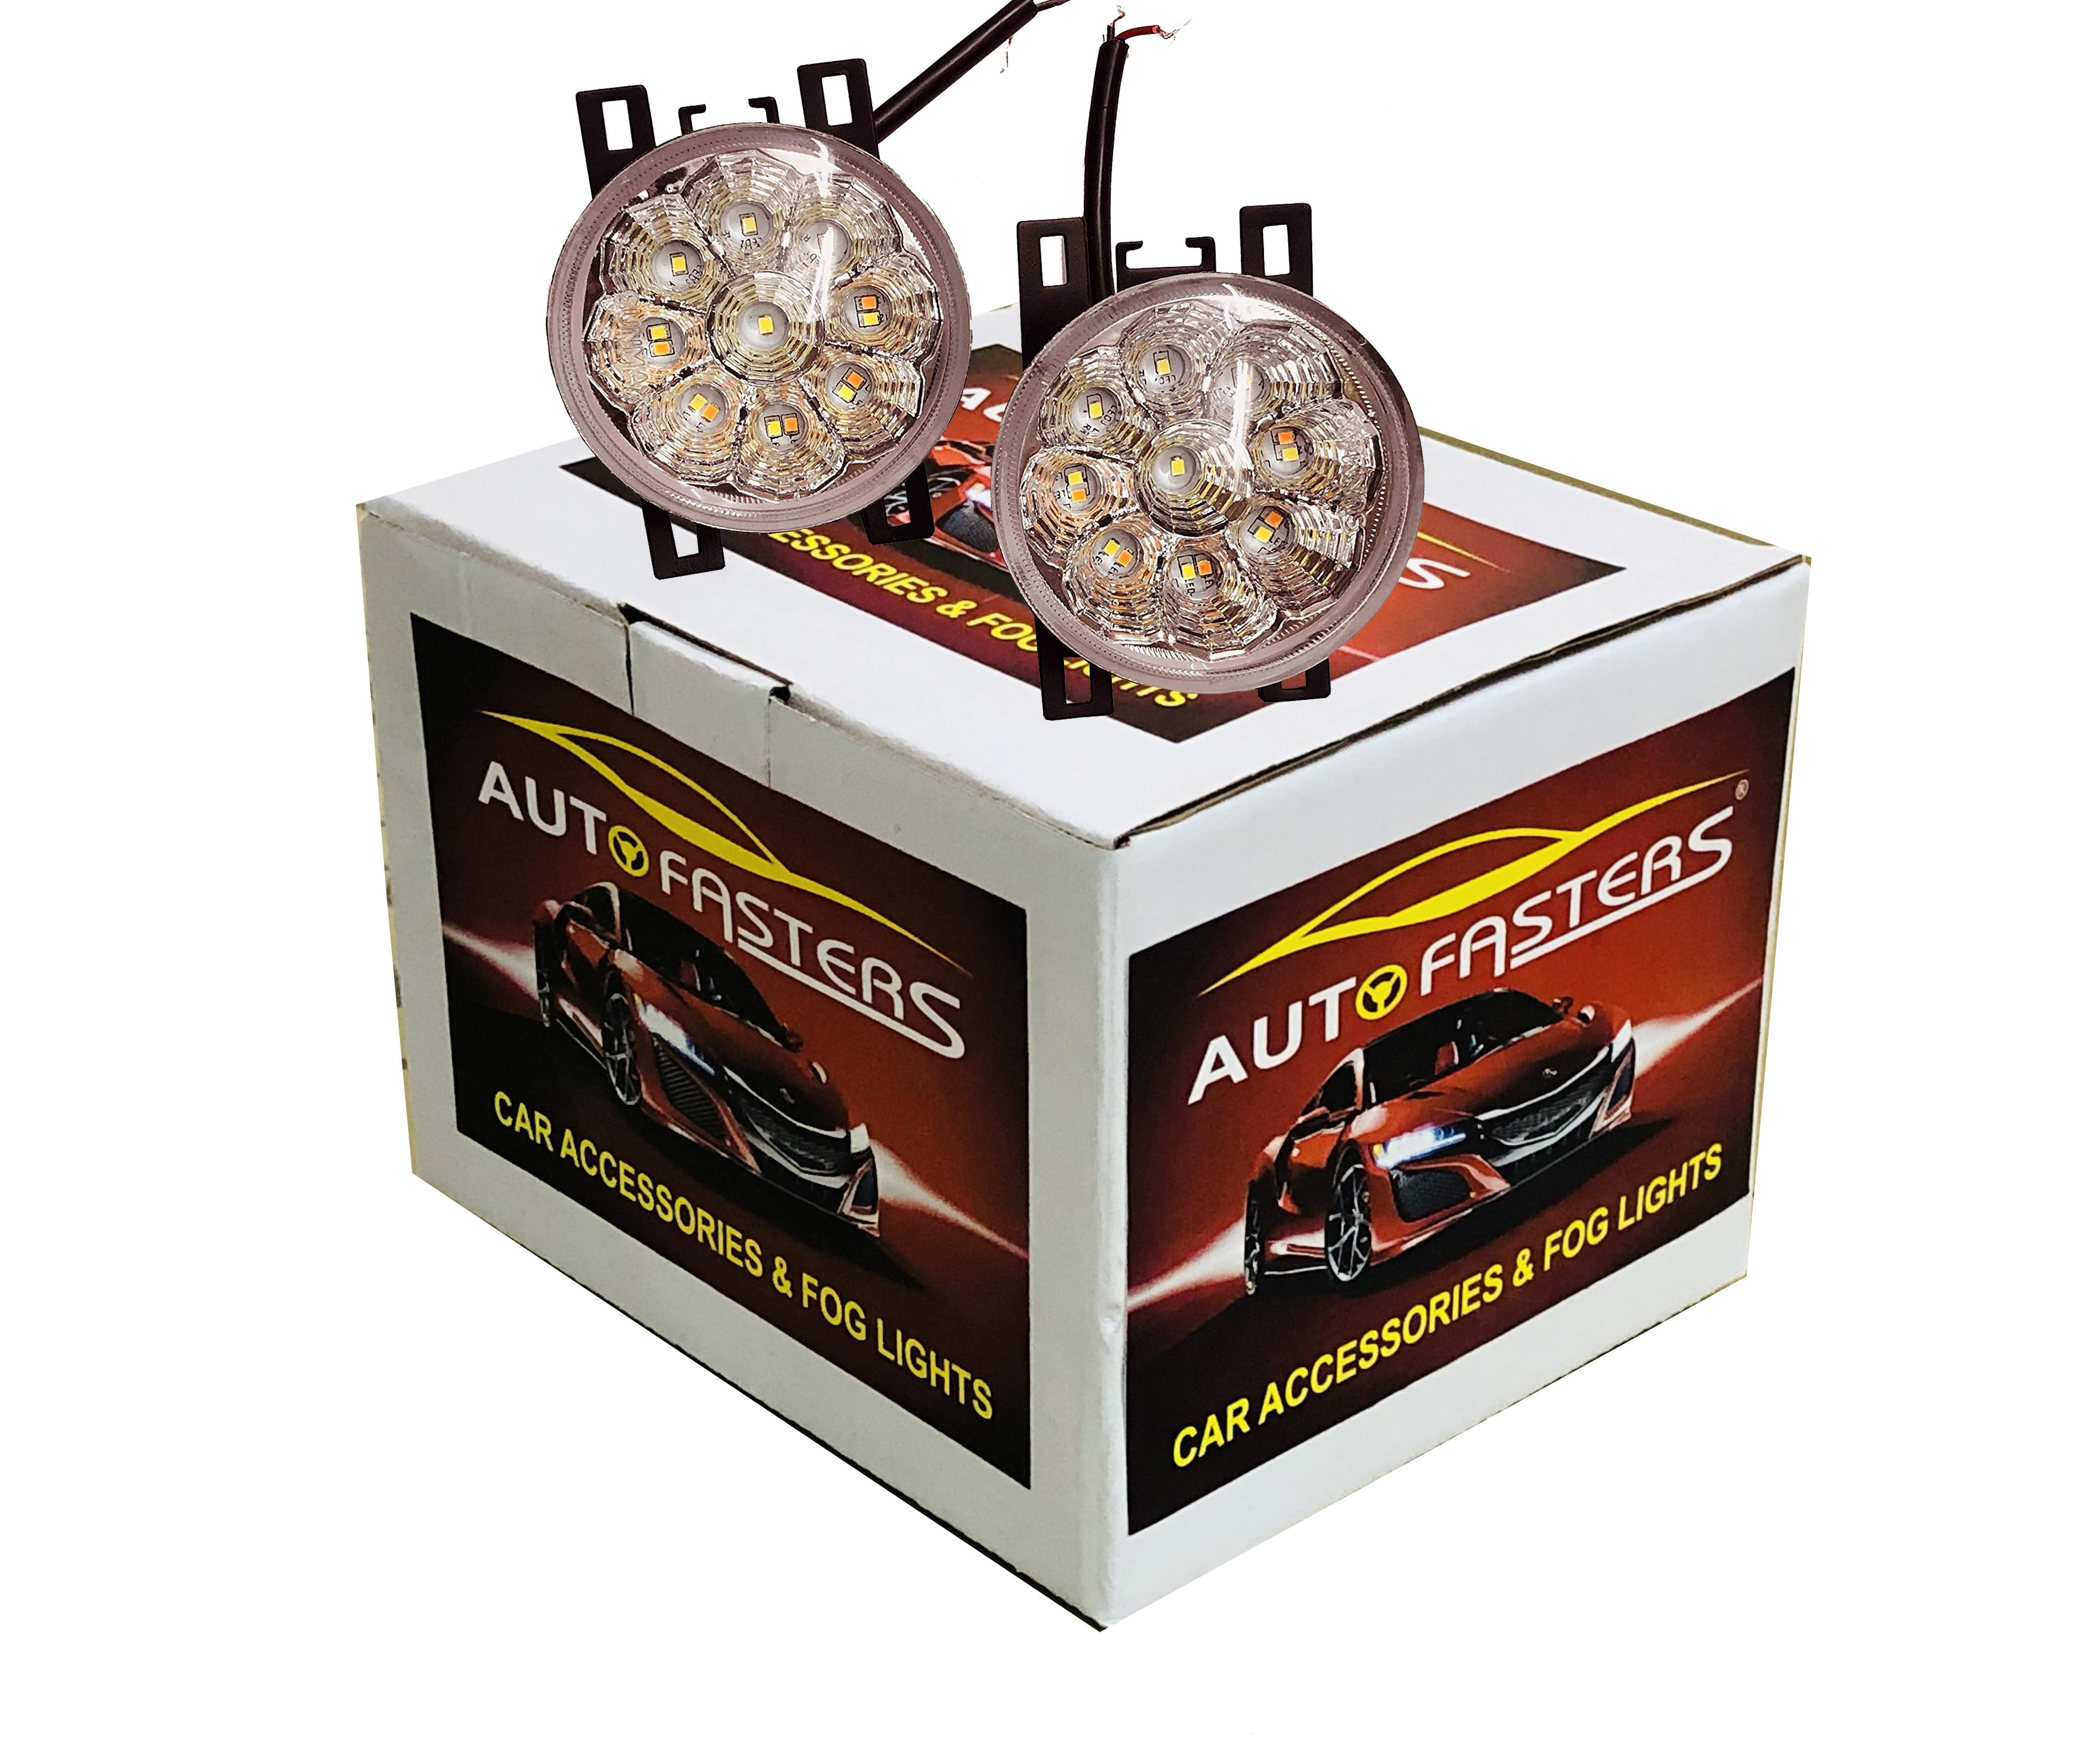 Led Car Fog Light With indicator For Swift, Ritz, Swift Dzire, Baleno, WagonR, S Cross, X L 6, Eartia, SX4, Ignis, Ciaz, Brezza, Celerio, old Alto